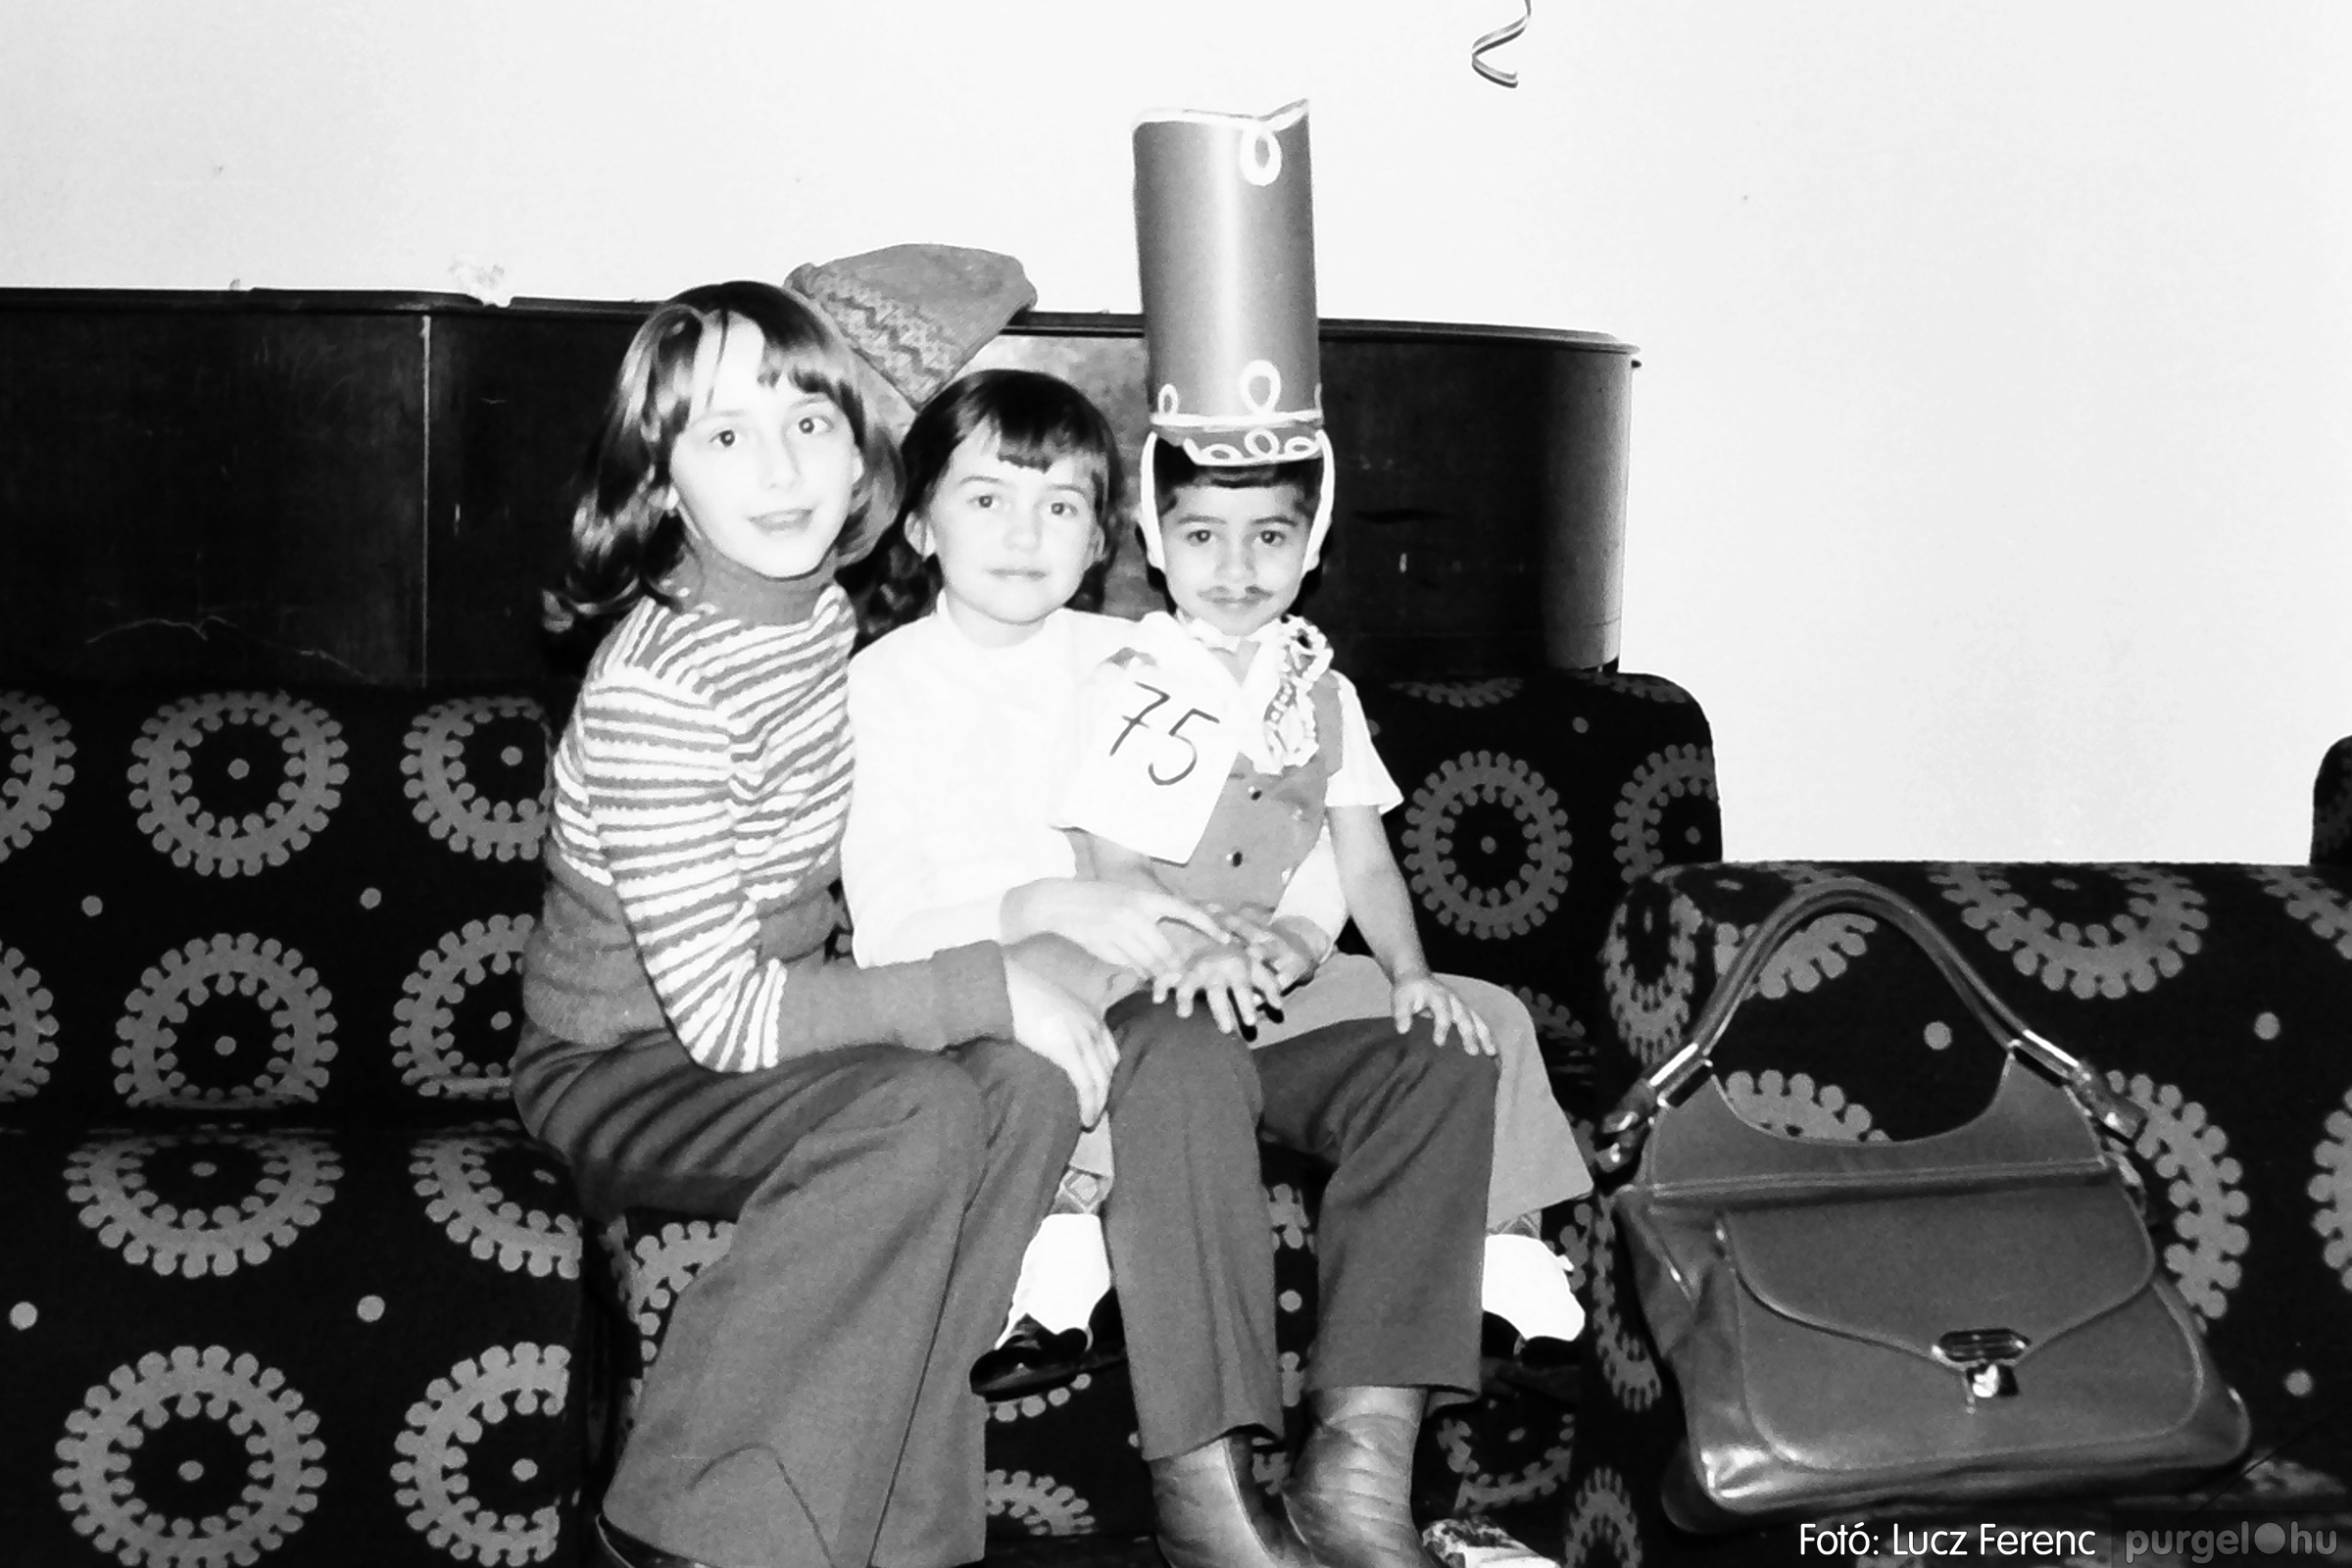 074. 1977. Farsang a gyermekotthonban 012. - Fotó: Lucz Ferenc.jpg